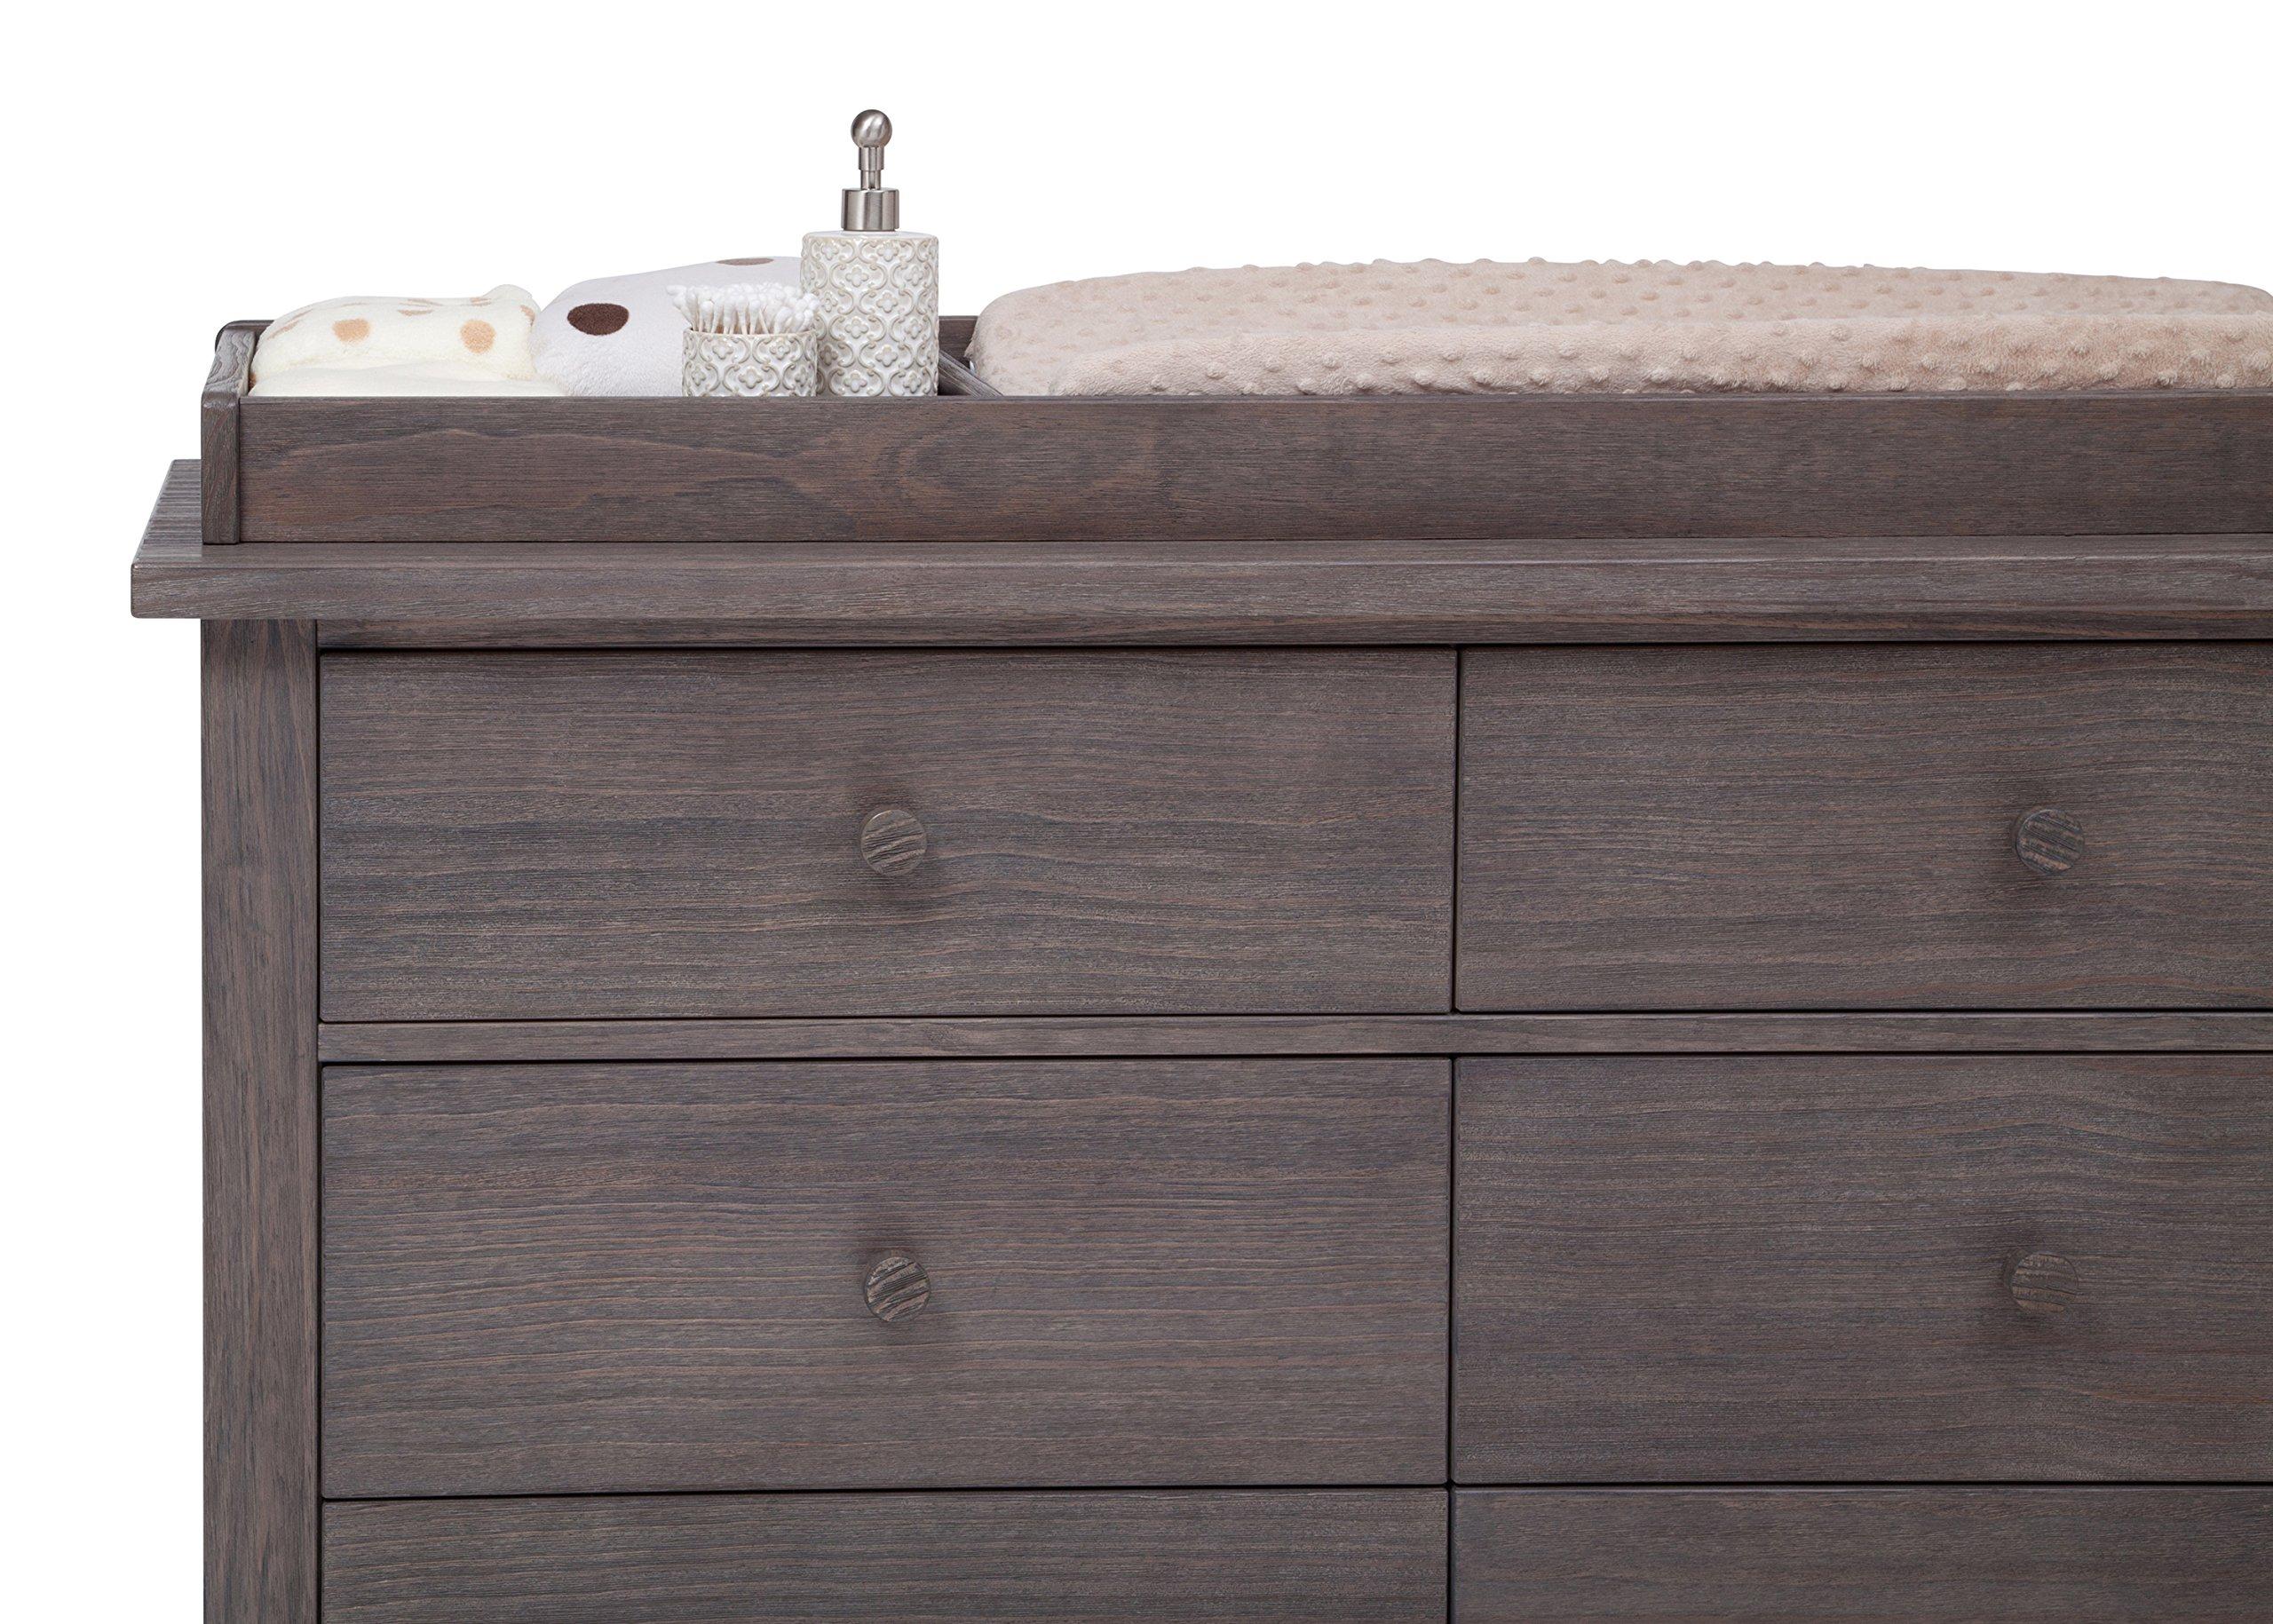 Serta Northbrook Changing Top, Rustic Grey by Serta (Image #3)